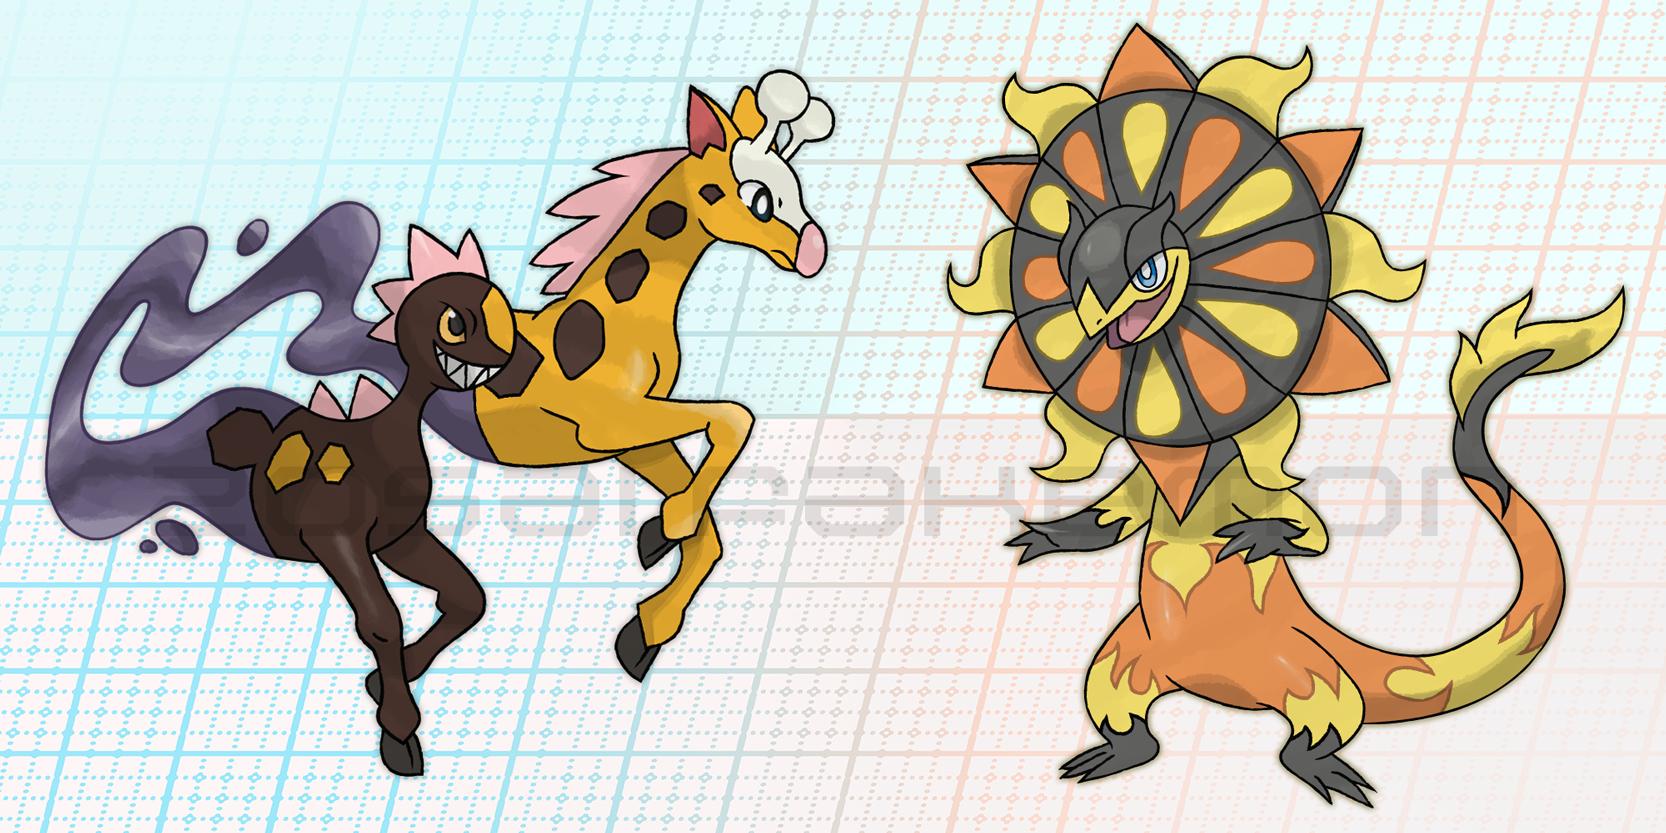 Mega evolutions fanart by zosai on deviantart - How to mega evolve a pokemon ...